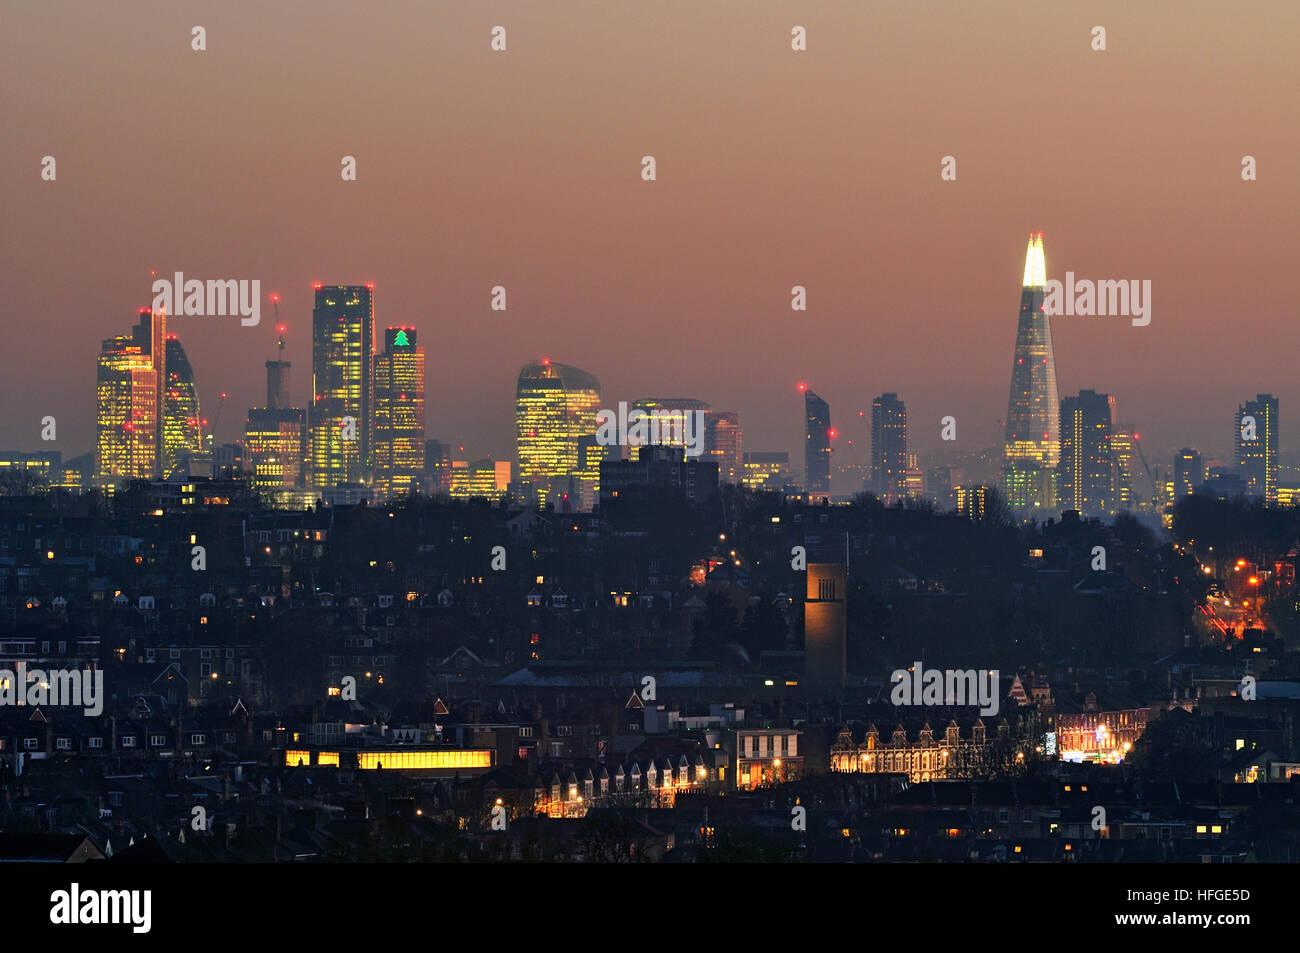 The City of London skyline at dusk, from Alexandra Palace, North London UK - Stock Image